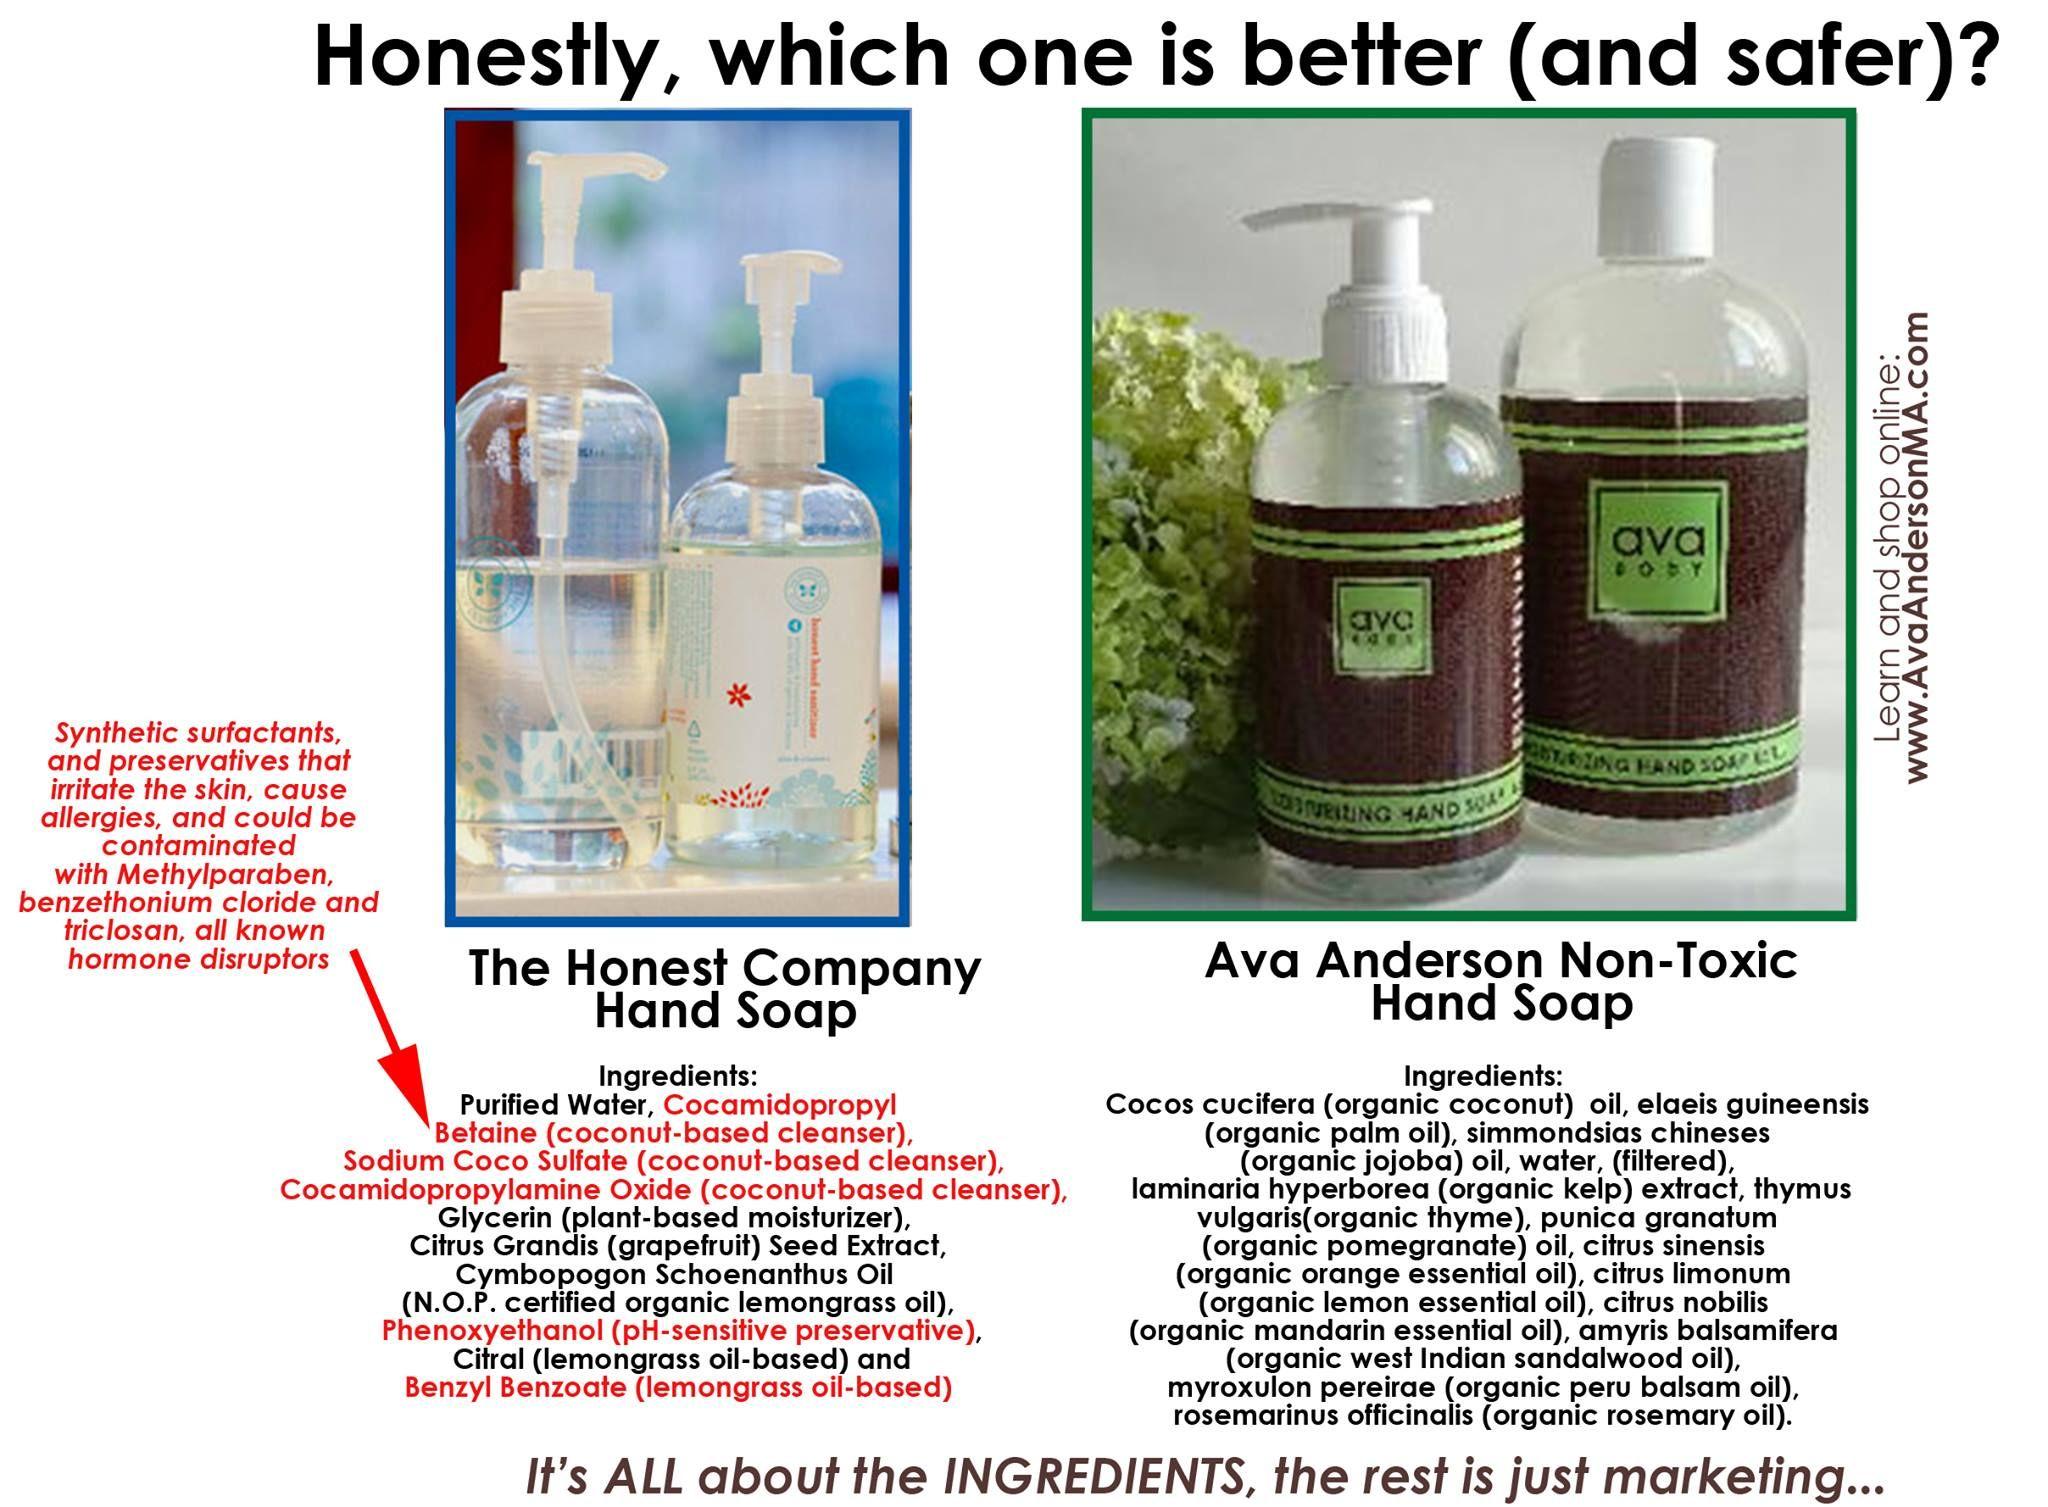 Honest Brand Hand Soap Versus Ava Anderson Ava Anderson